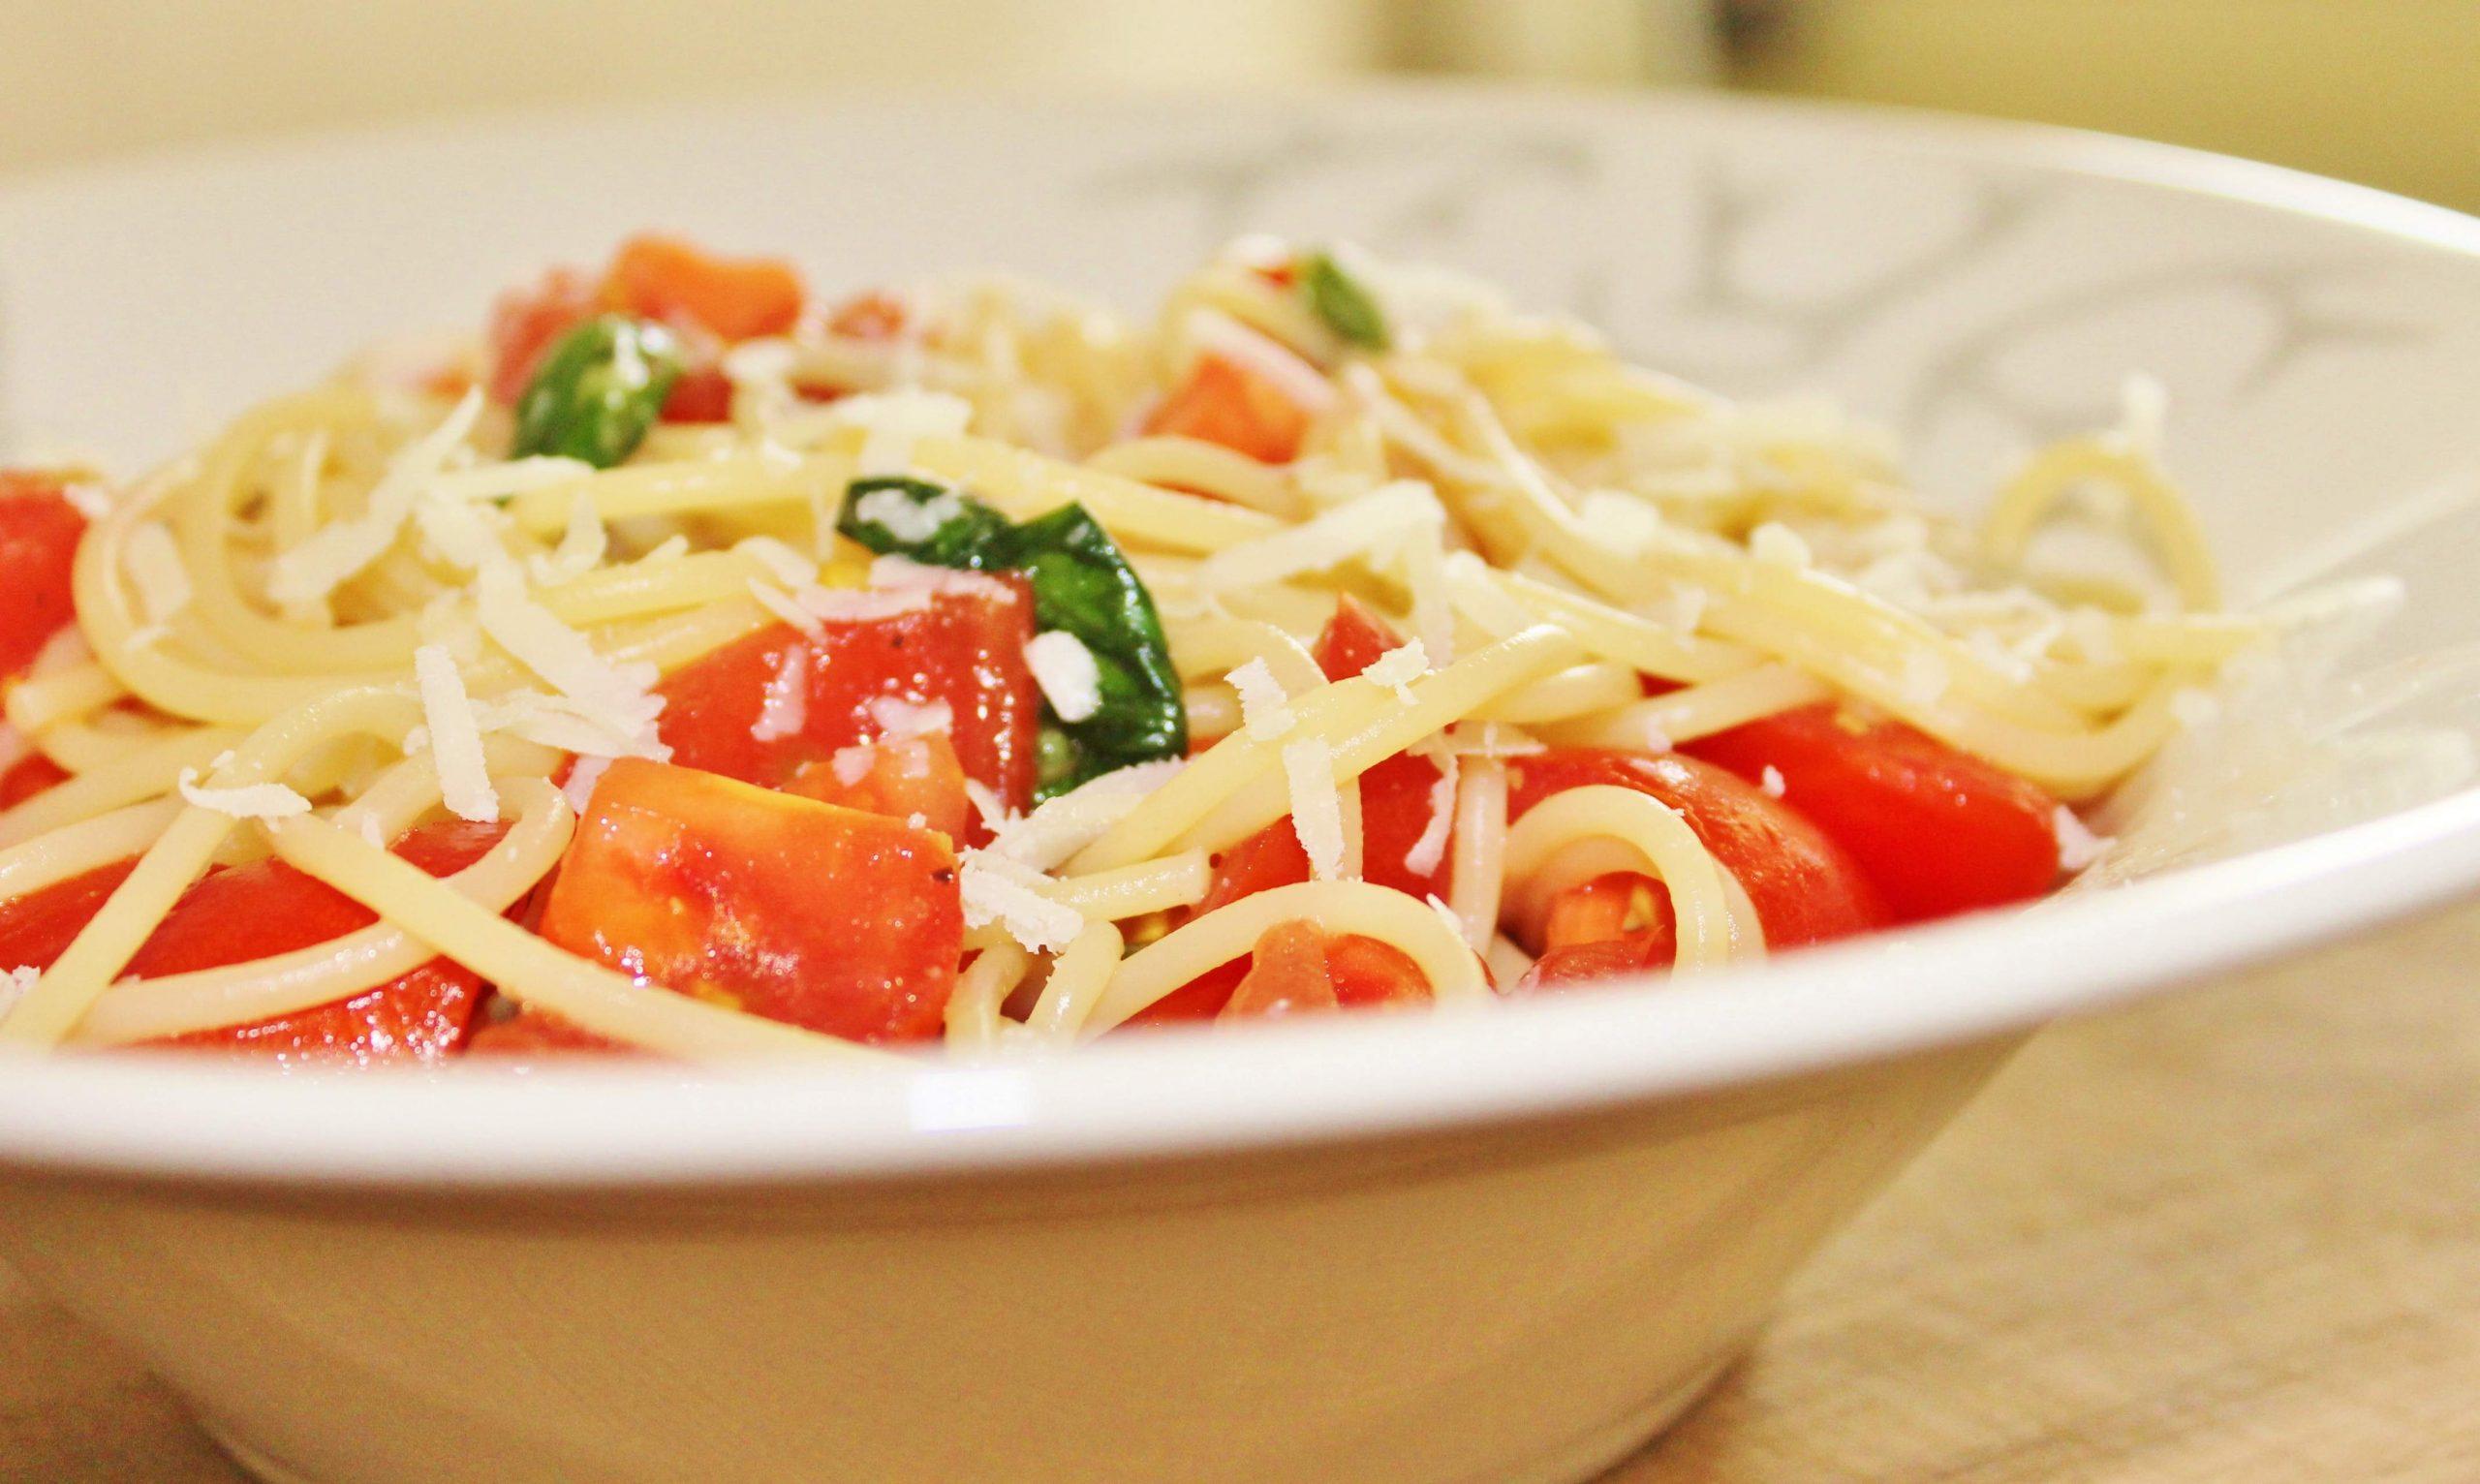 Tjestenina s crvenim sosom